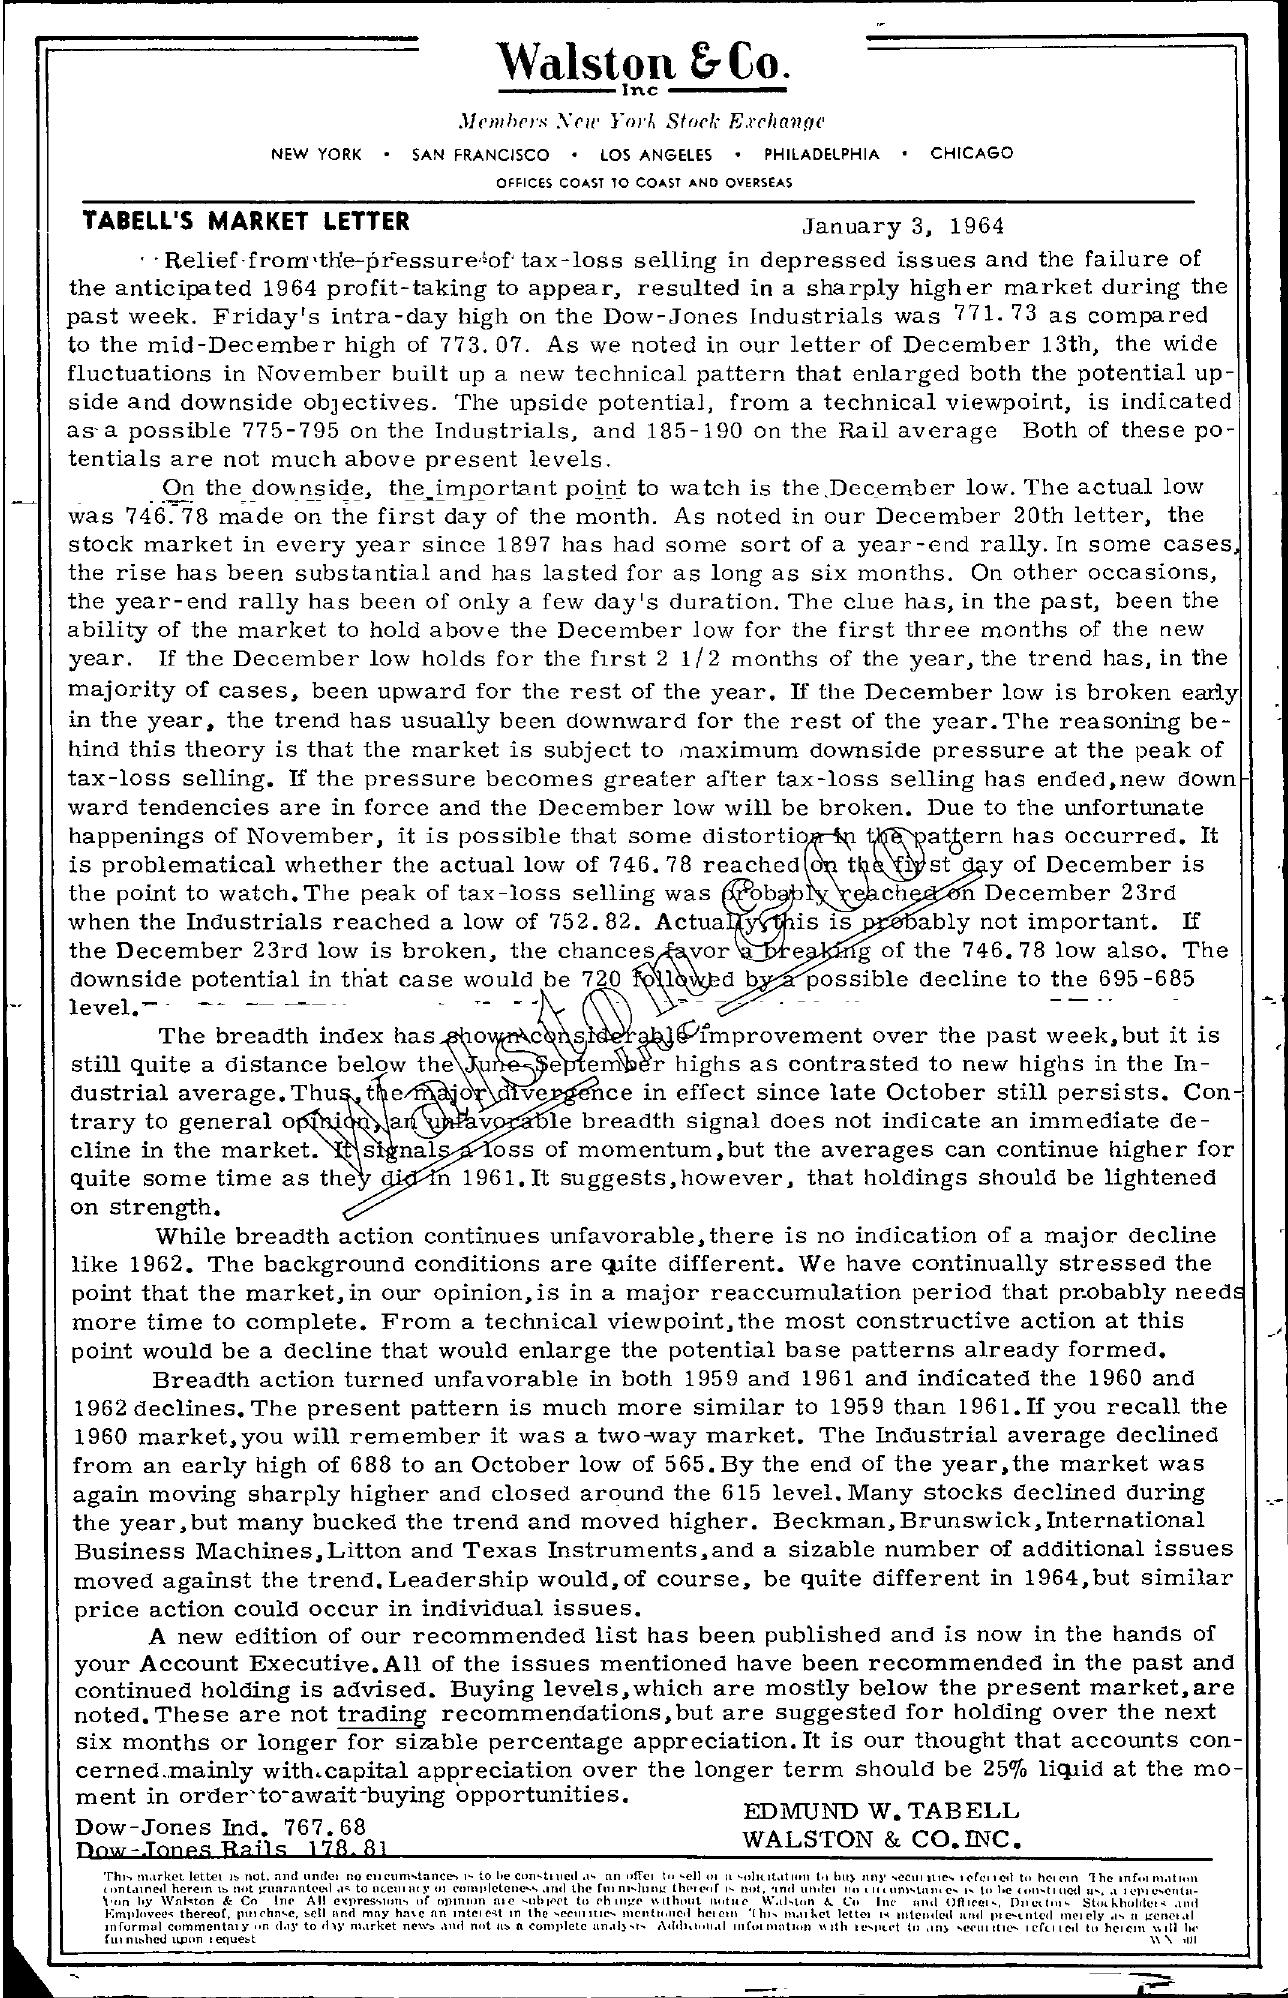 Tabell's Market Letter - January 03, 1964